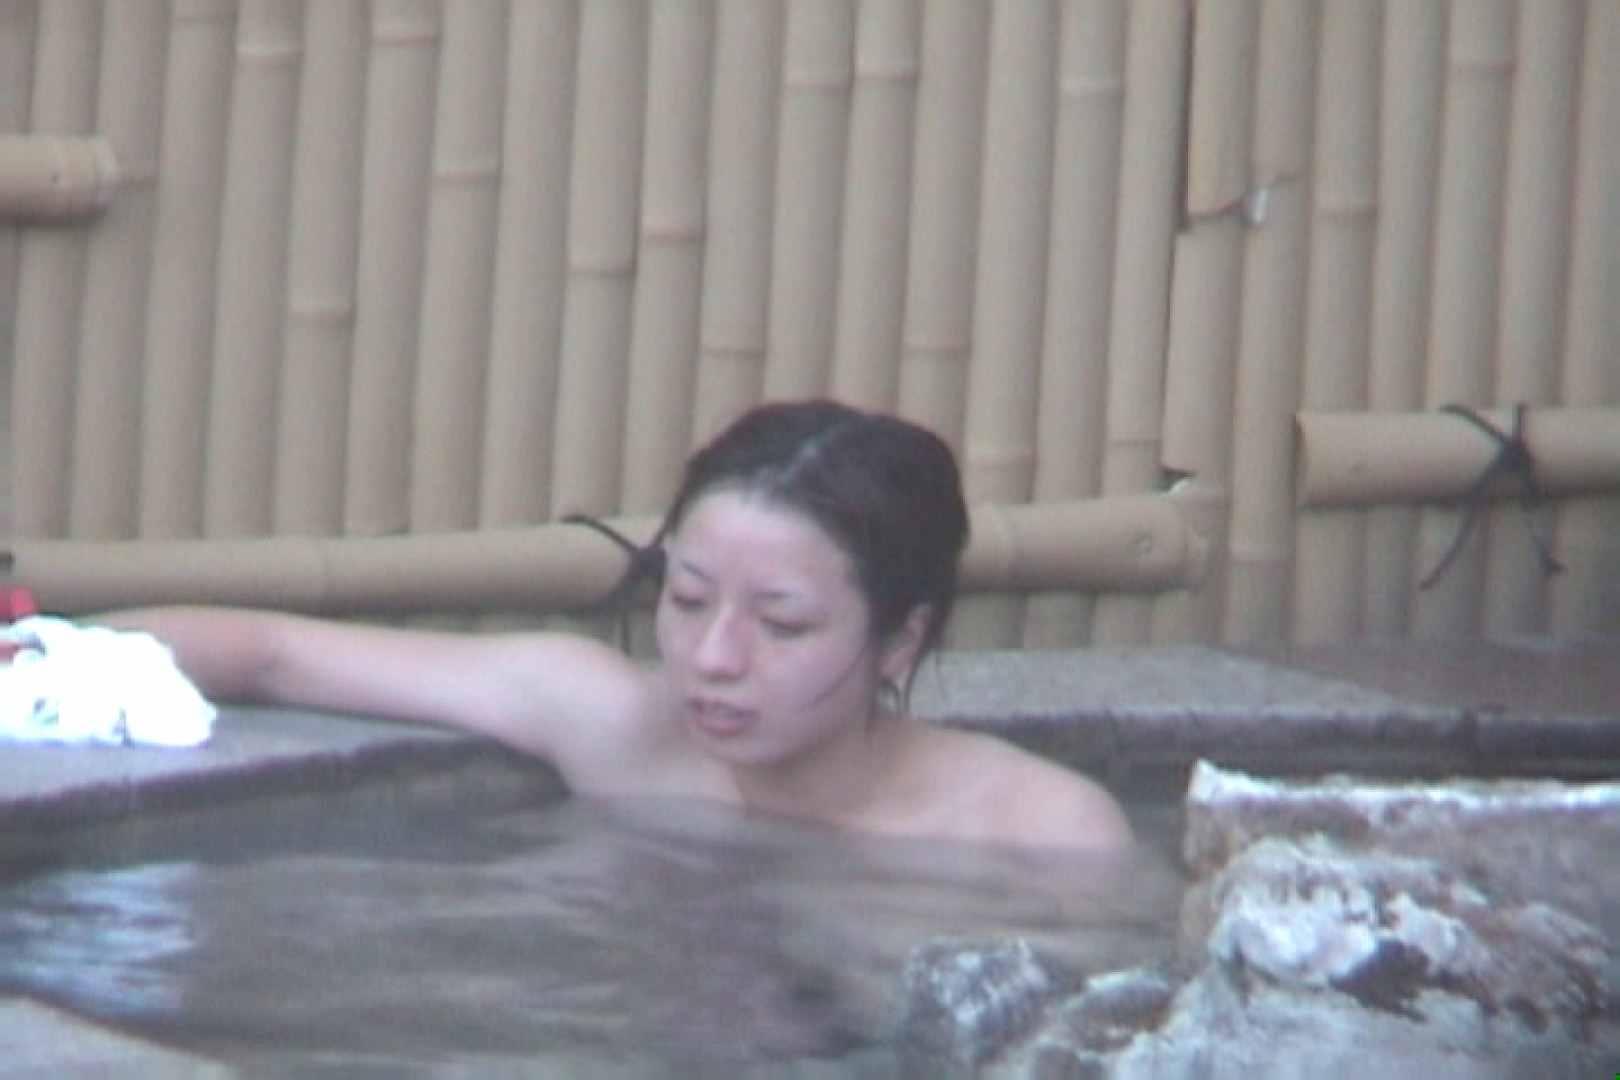 Aquaな露天風呂Vol.608 露天風呂突入 | 盗撮師作品  95pic 55